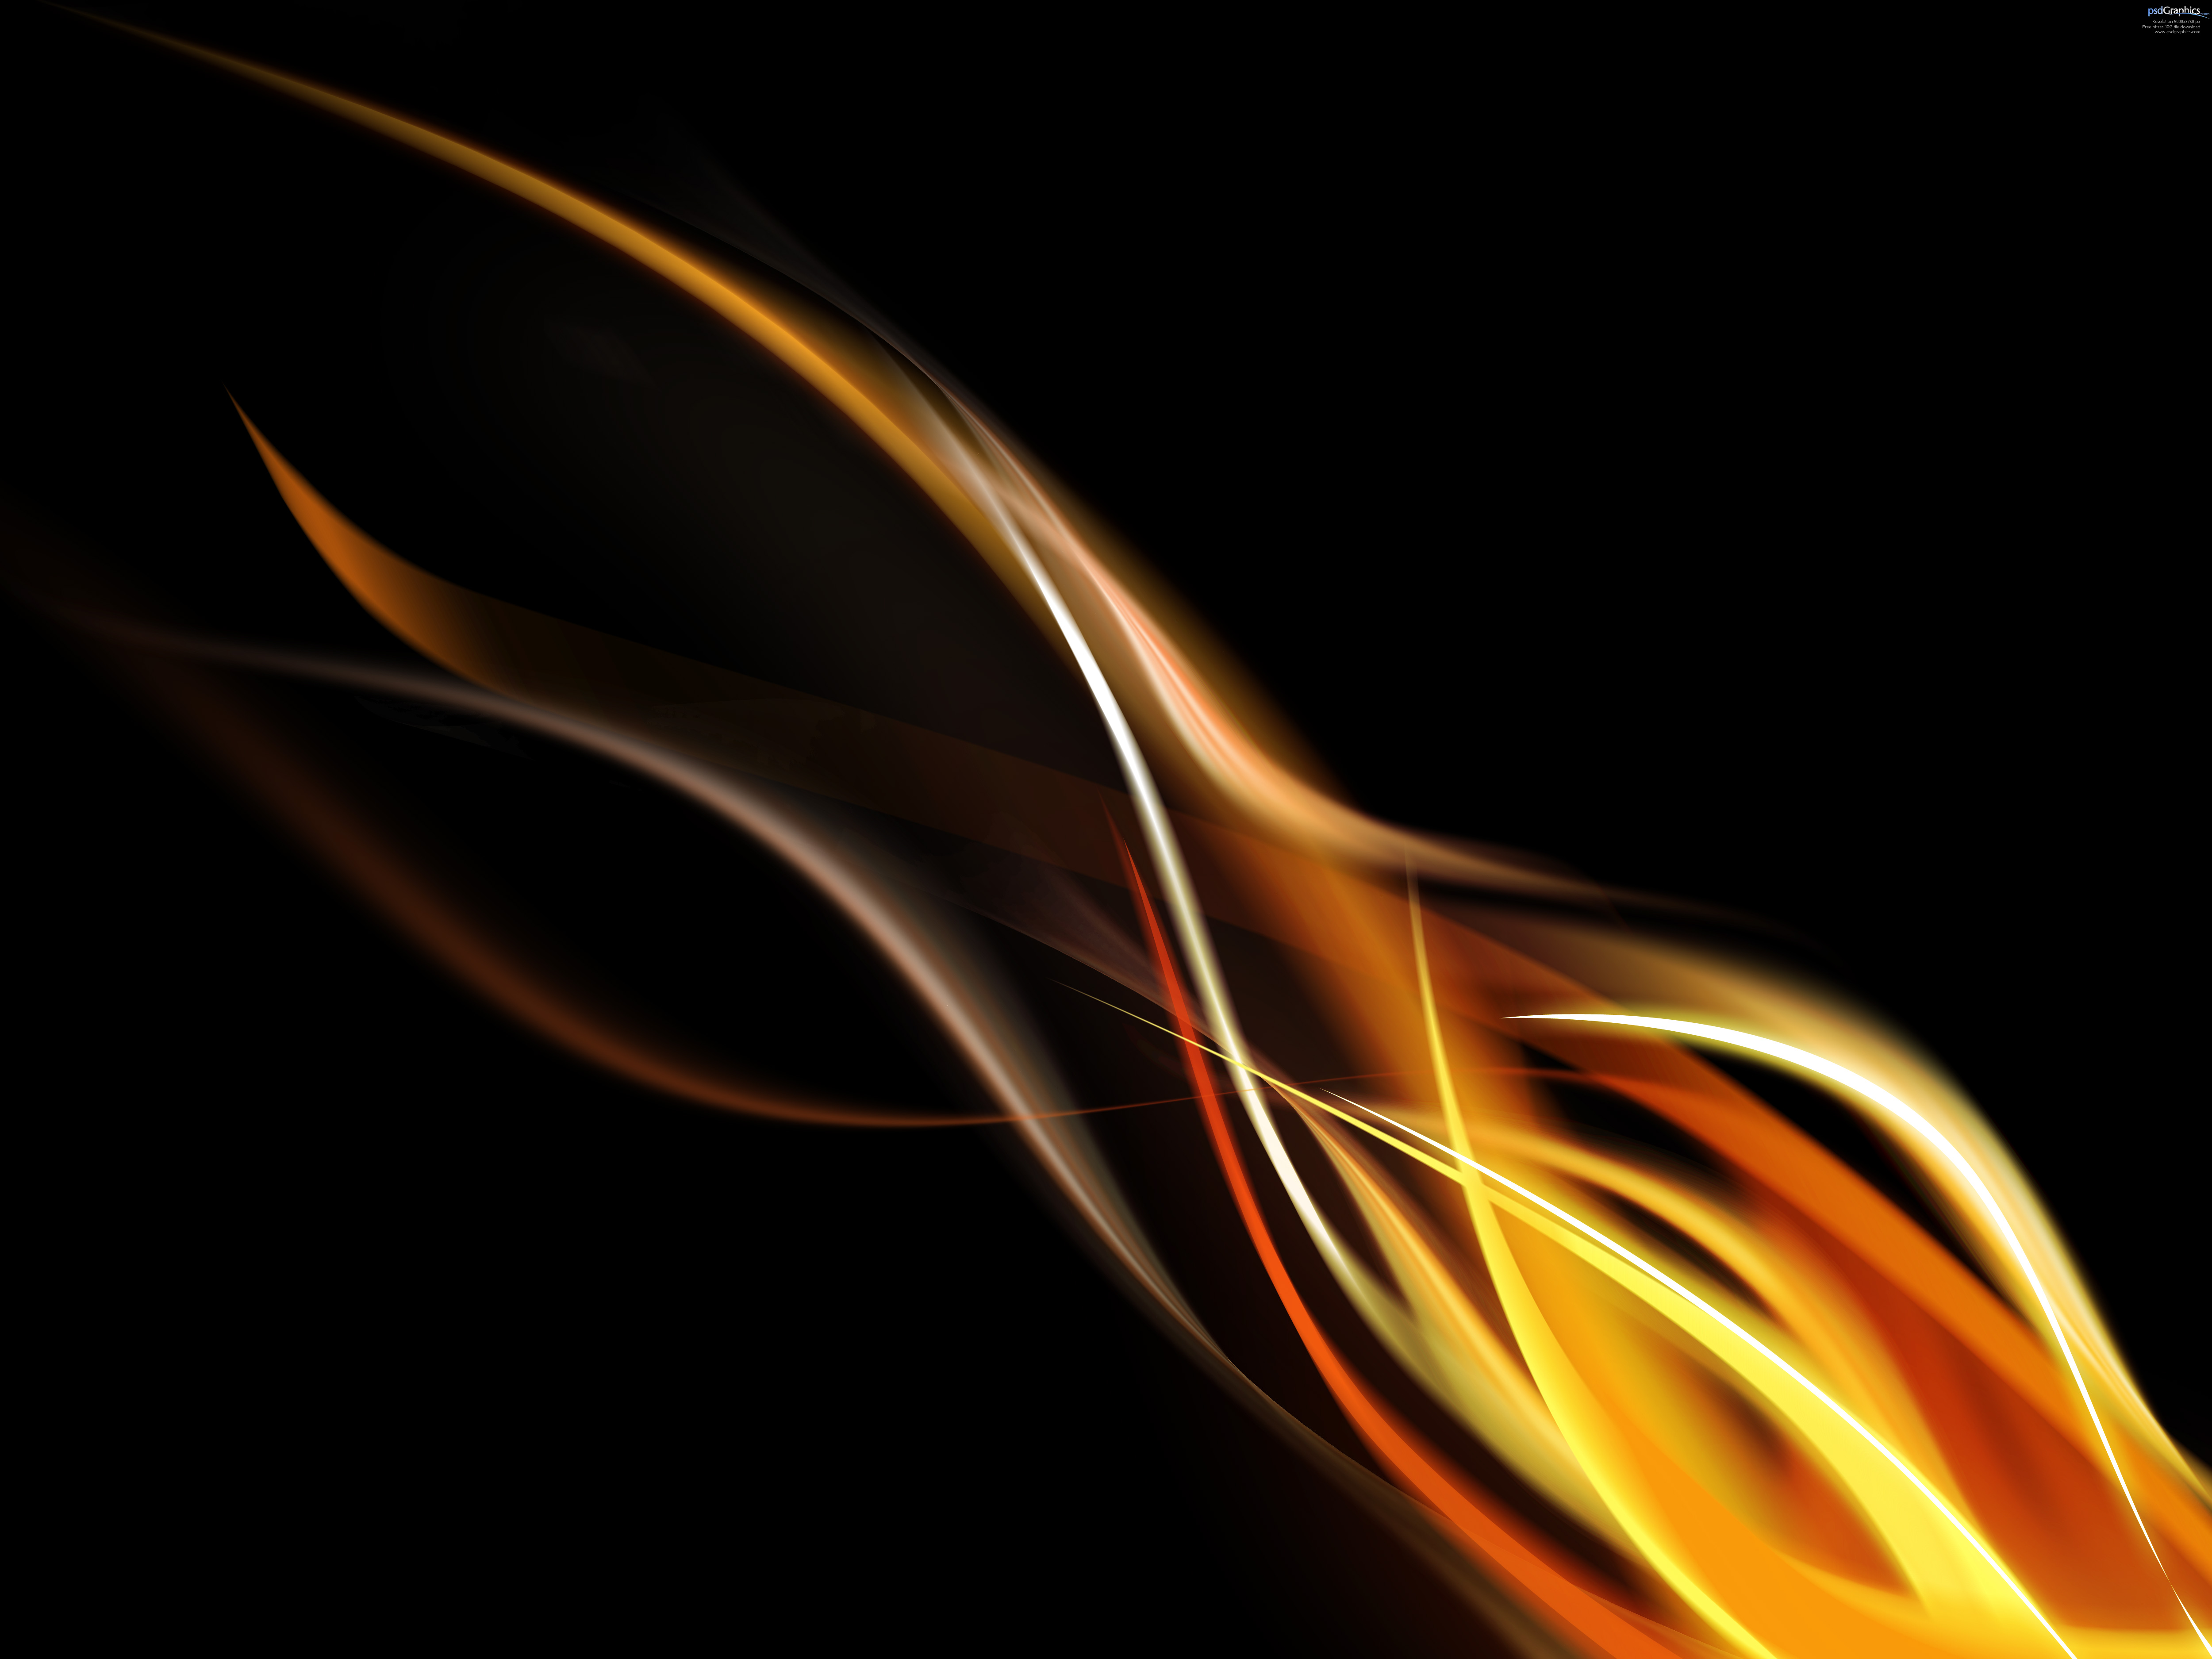 Photoshop flame background PSDGraphics 5000x3750